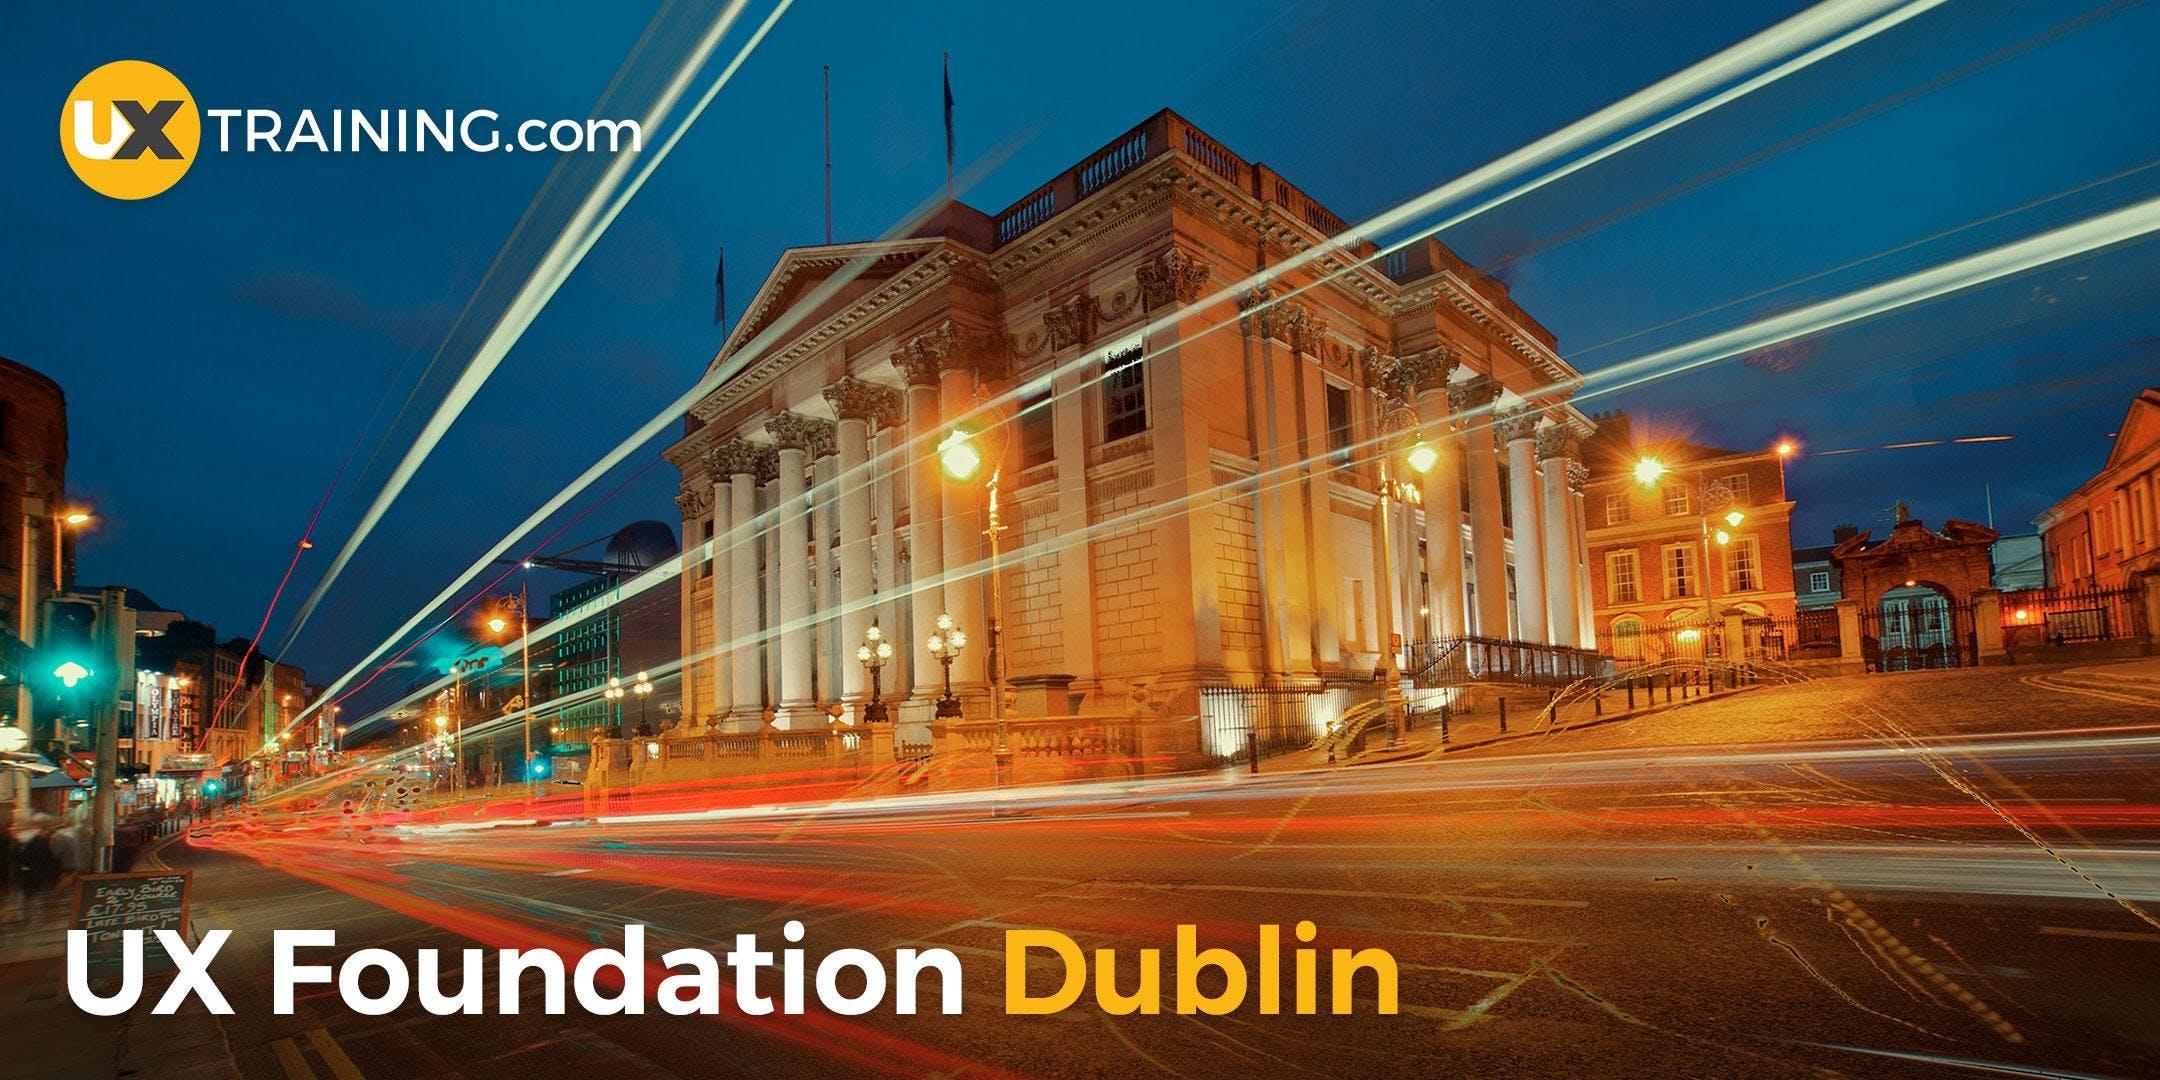 UX Foundation Training  Dublin  June 2018